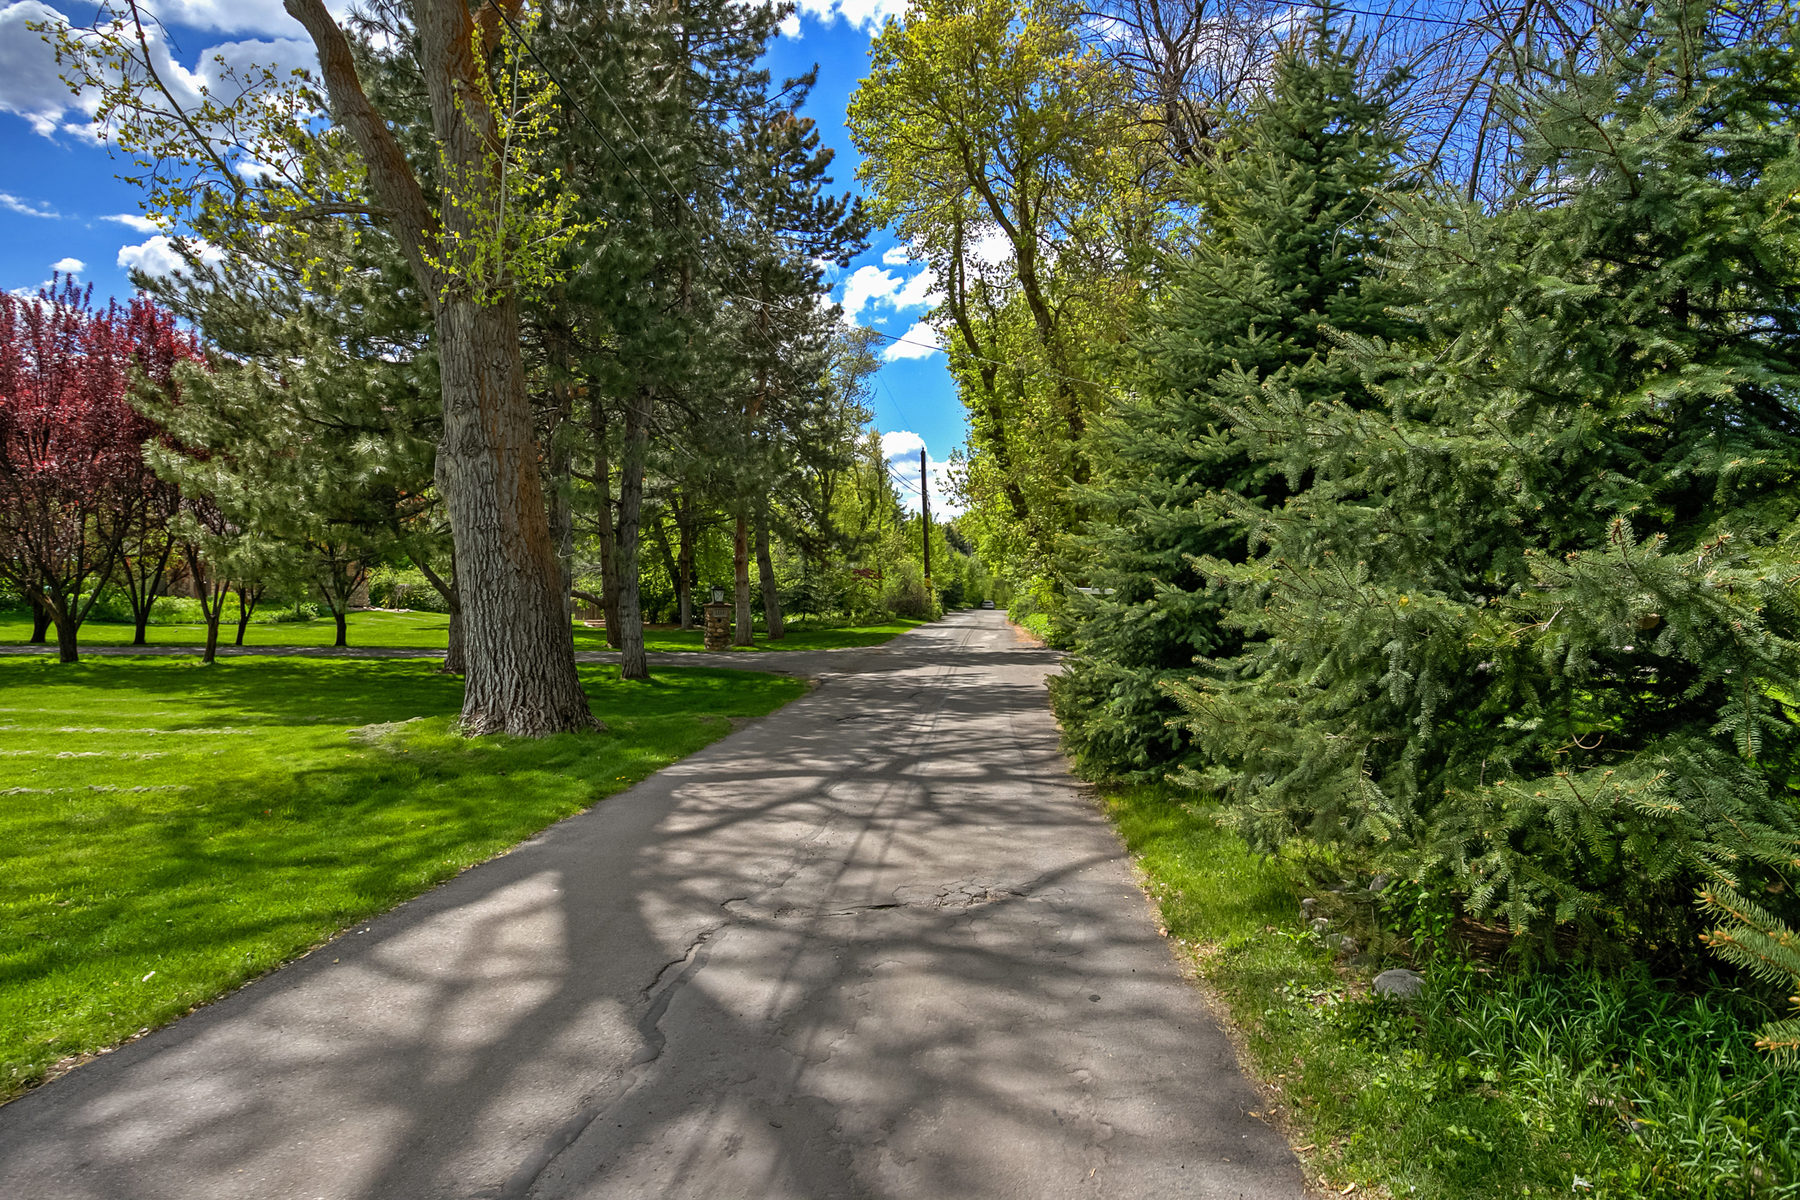 独户住宅 为 销售 在 Secluded 1 Acre Property 1967 E Forest Bend Dr 卡顿高地, 犹他州, 84121 美国